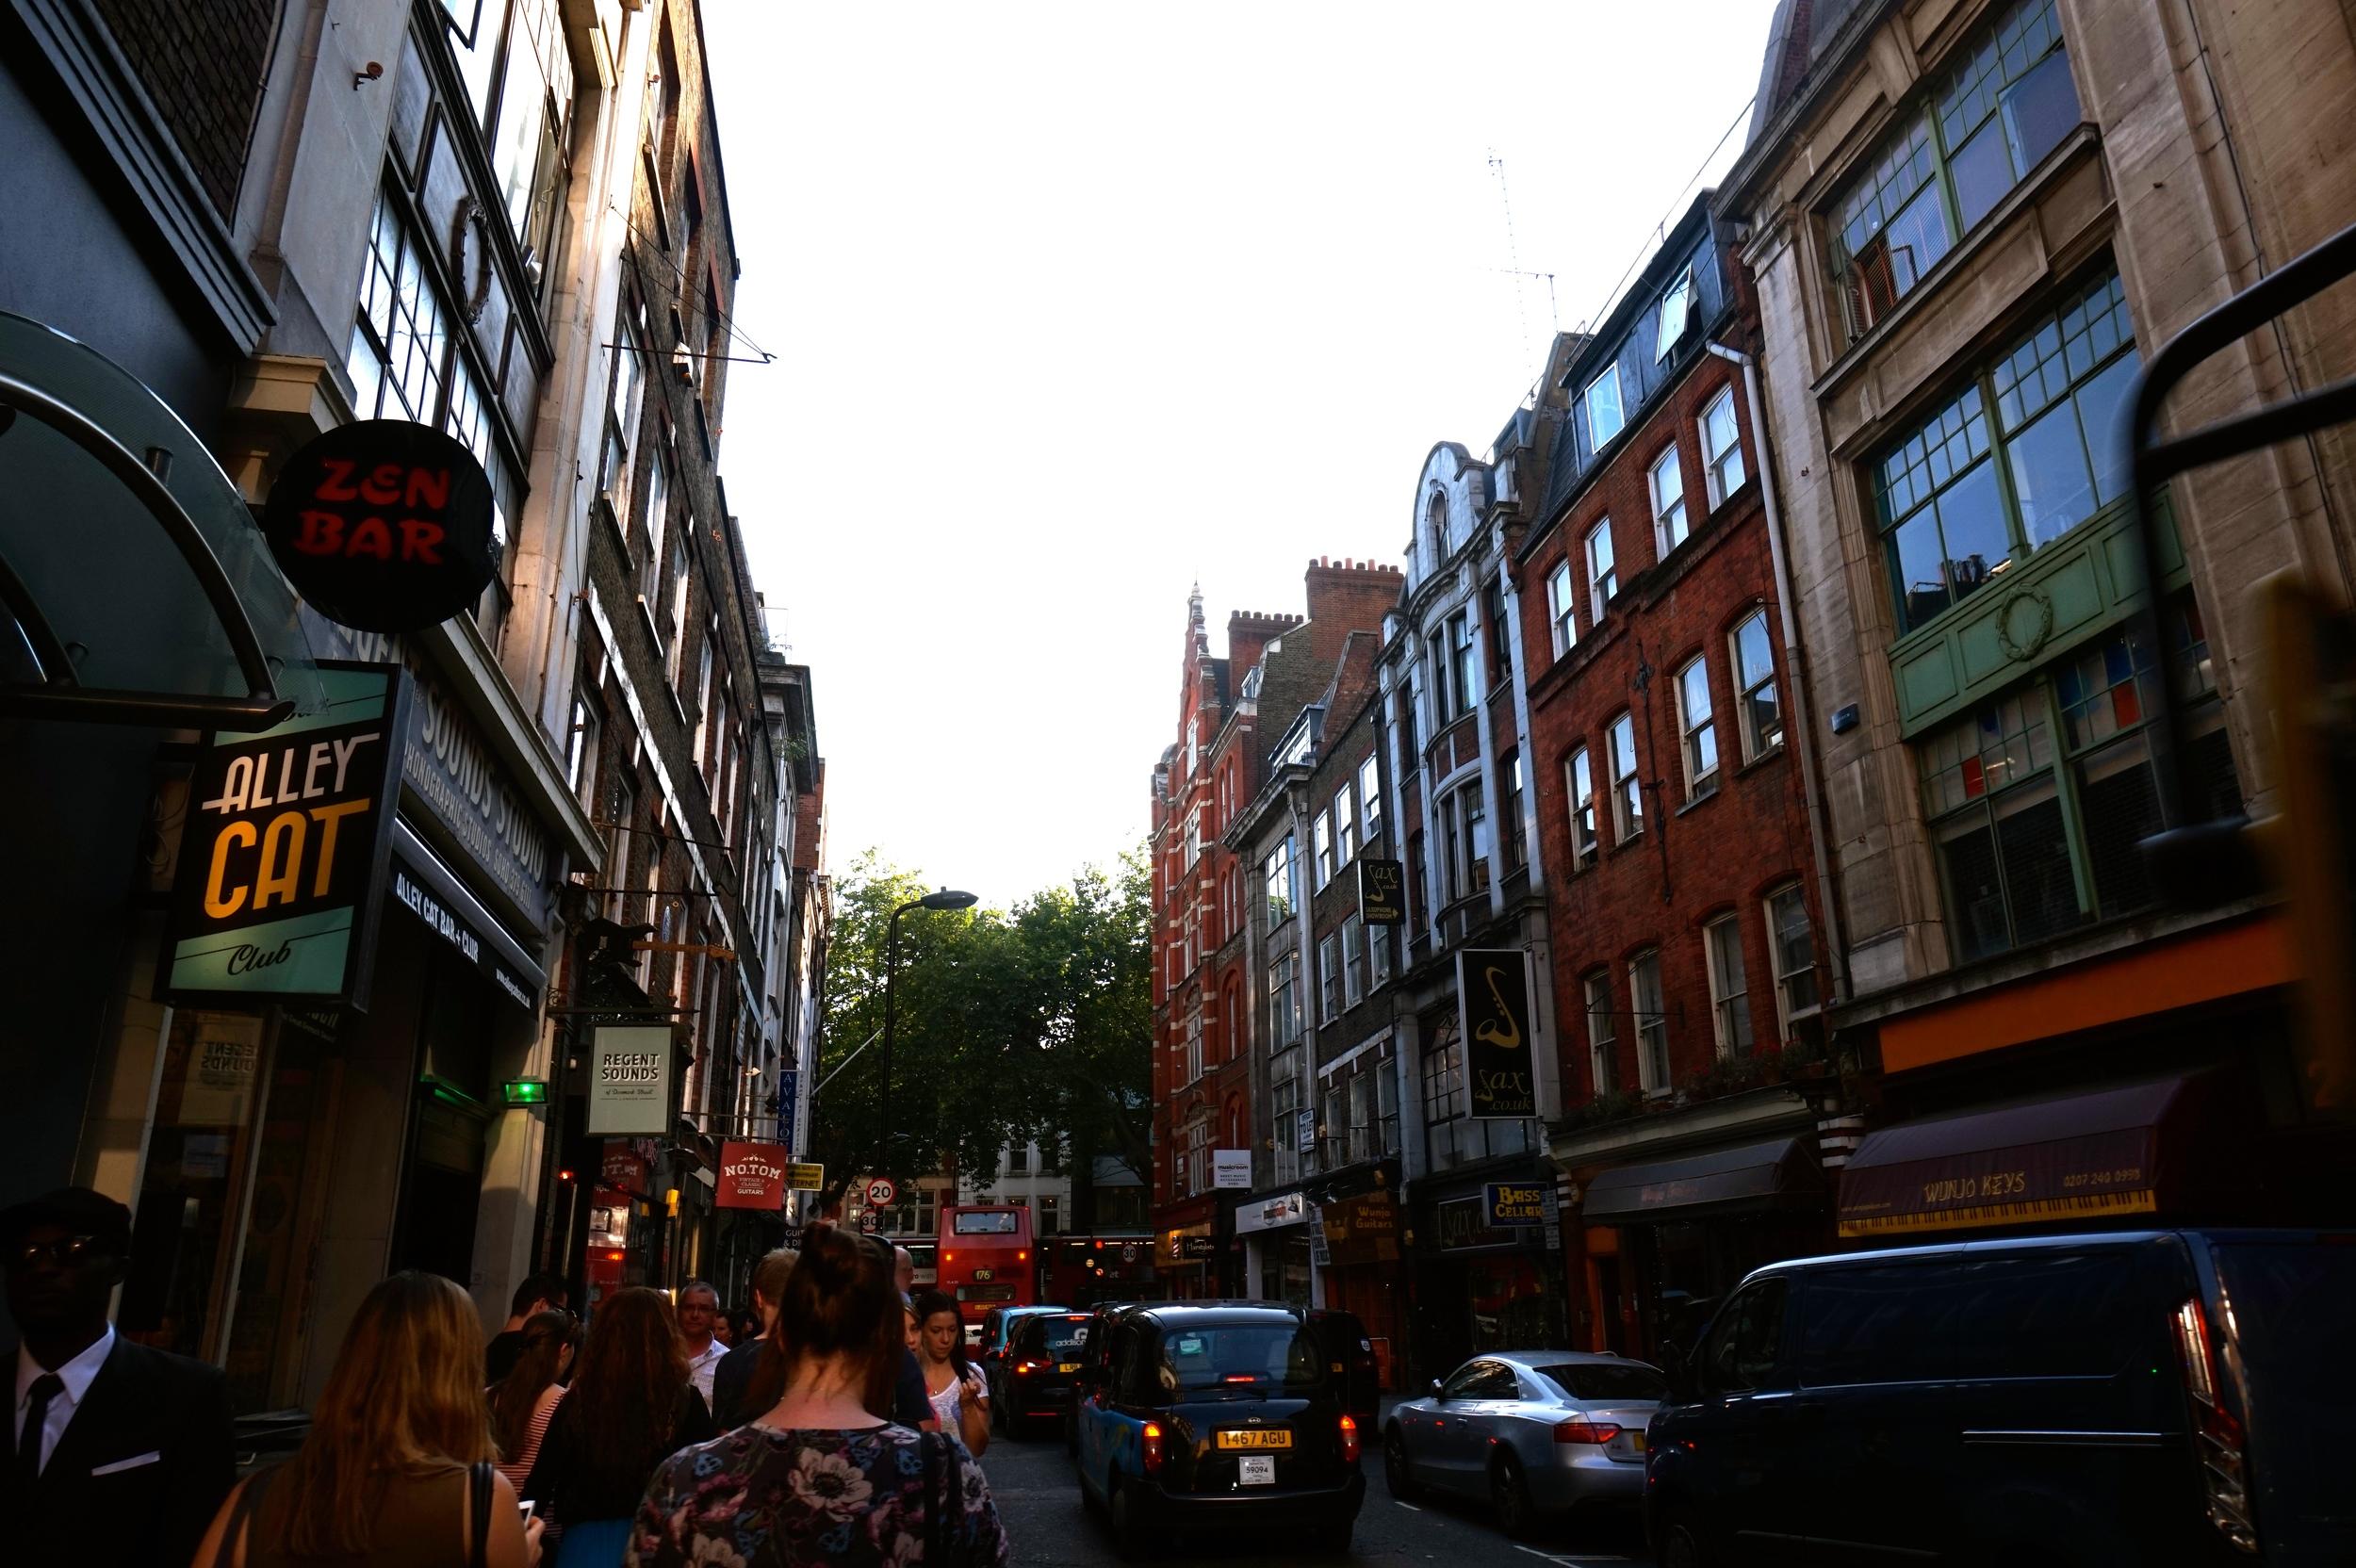 londondenmarkstreet.jpg